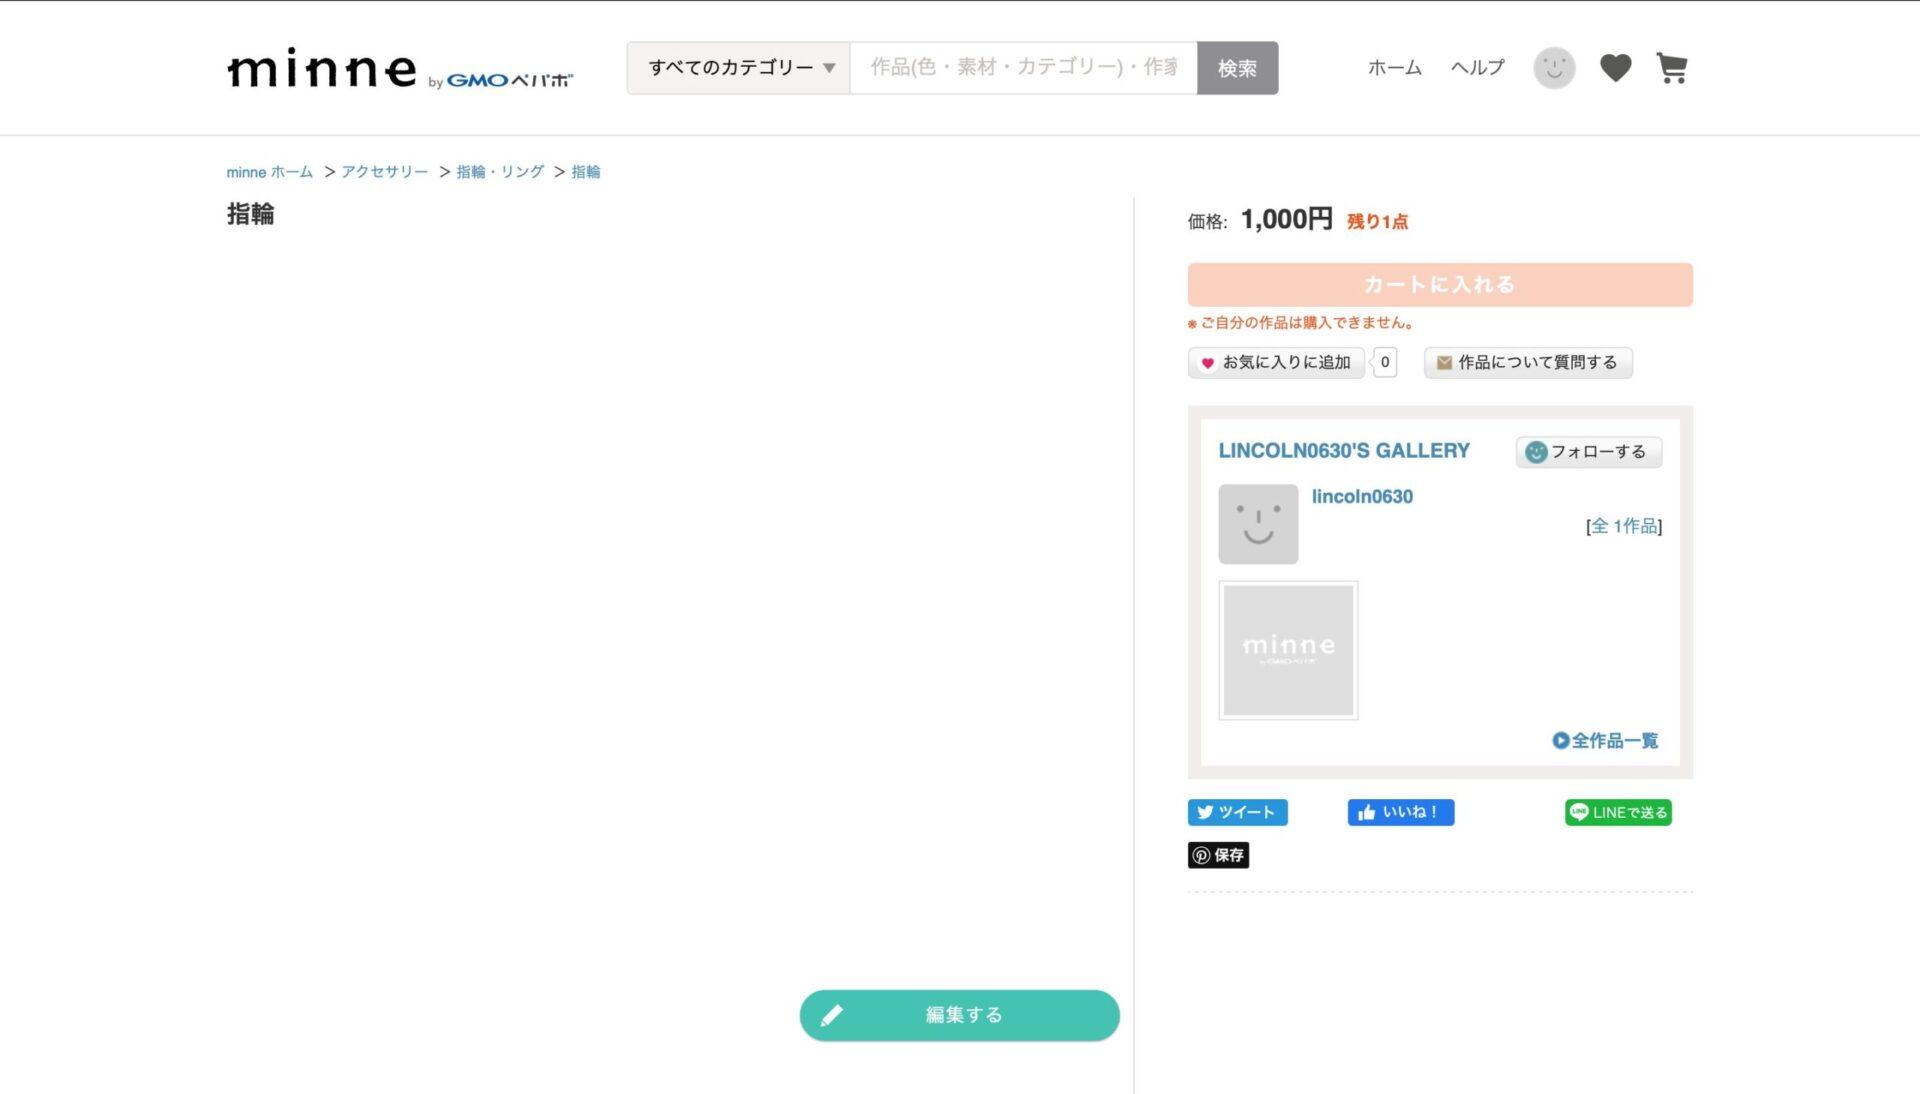 PC版 minne(ミンネ)で出品する手順